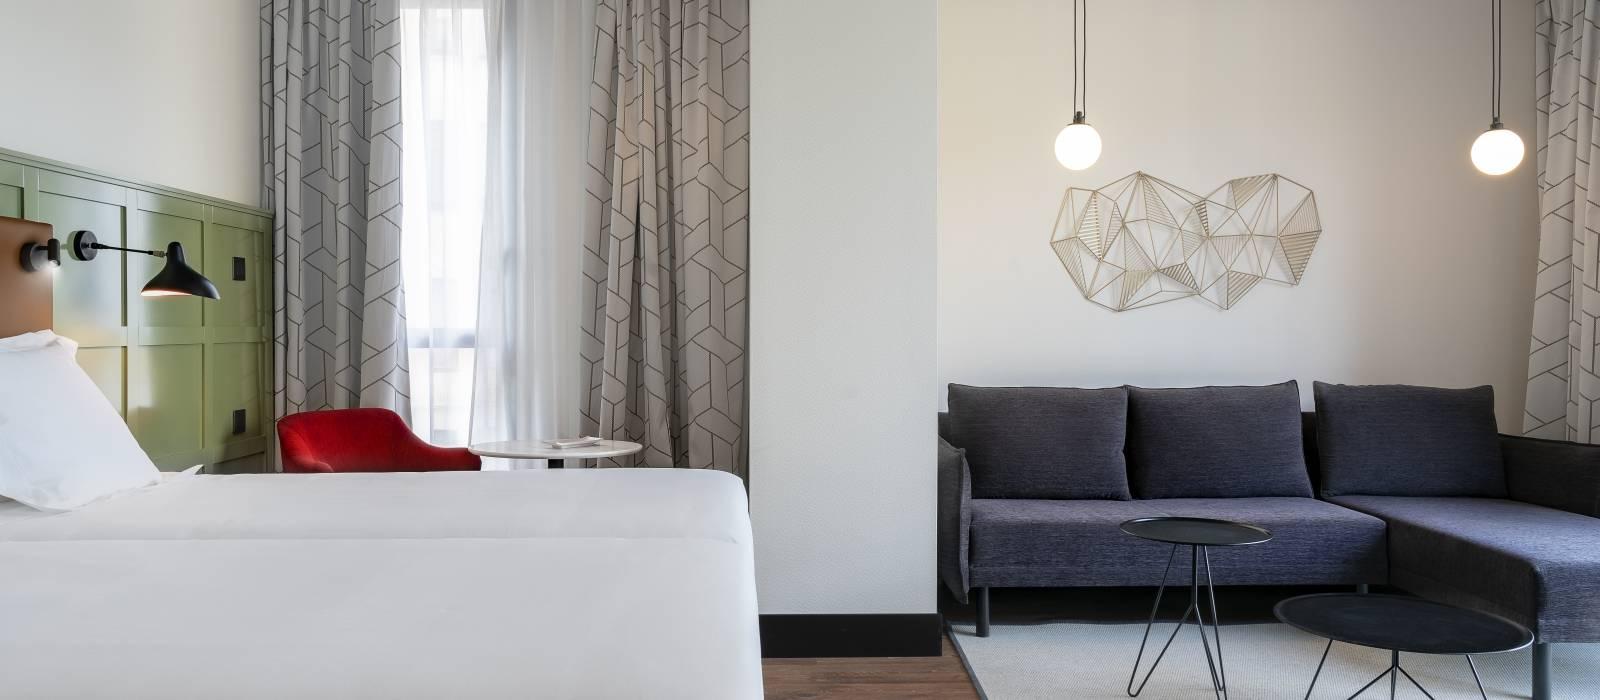 Vincci bilbao - Junior suite con vista sul museo Guggenheim